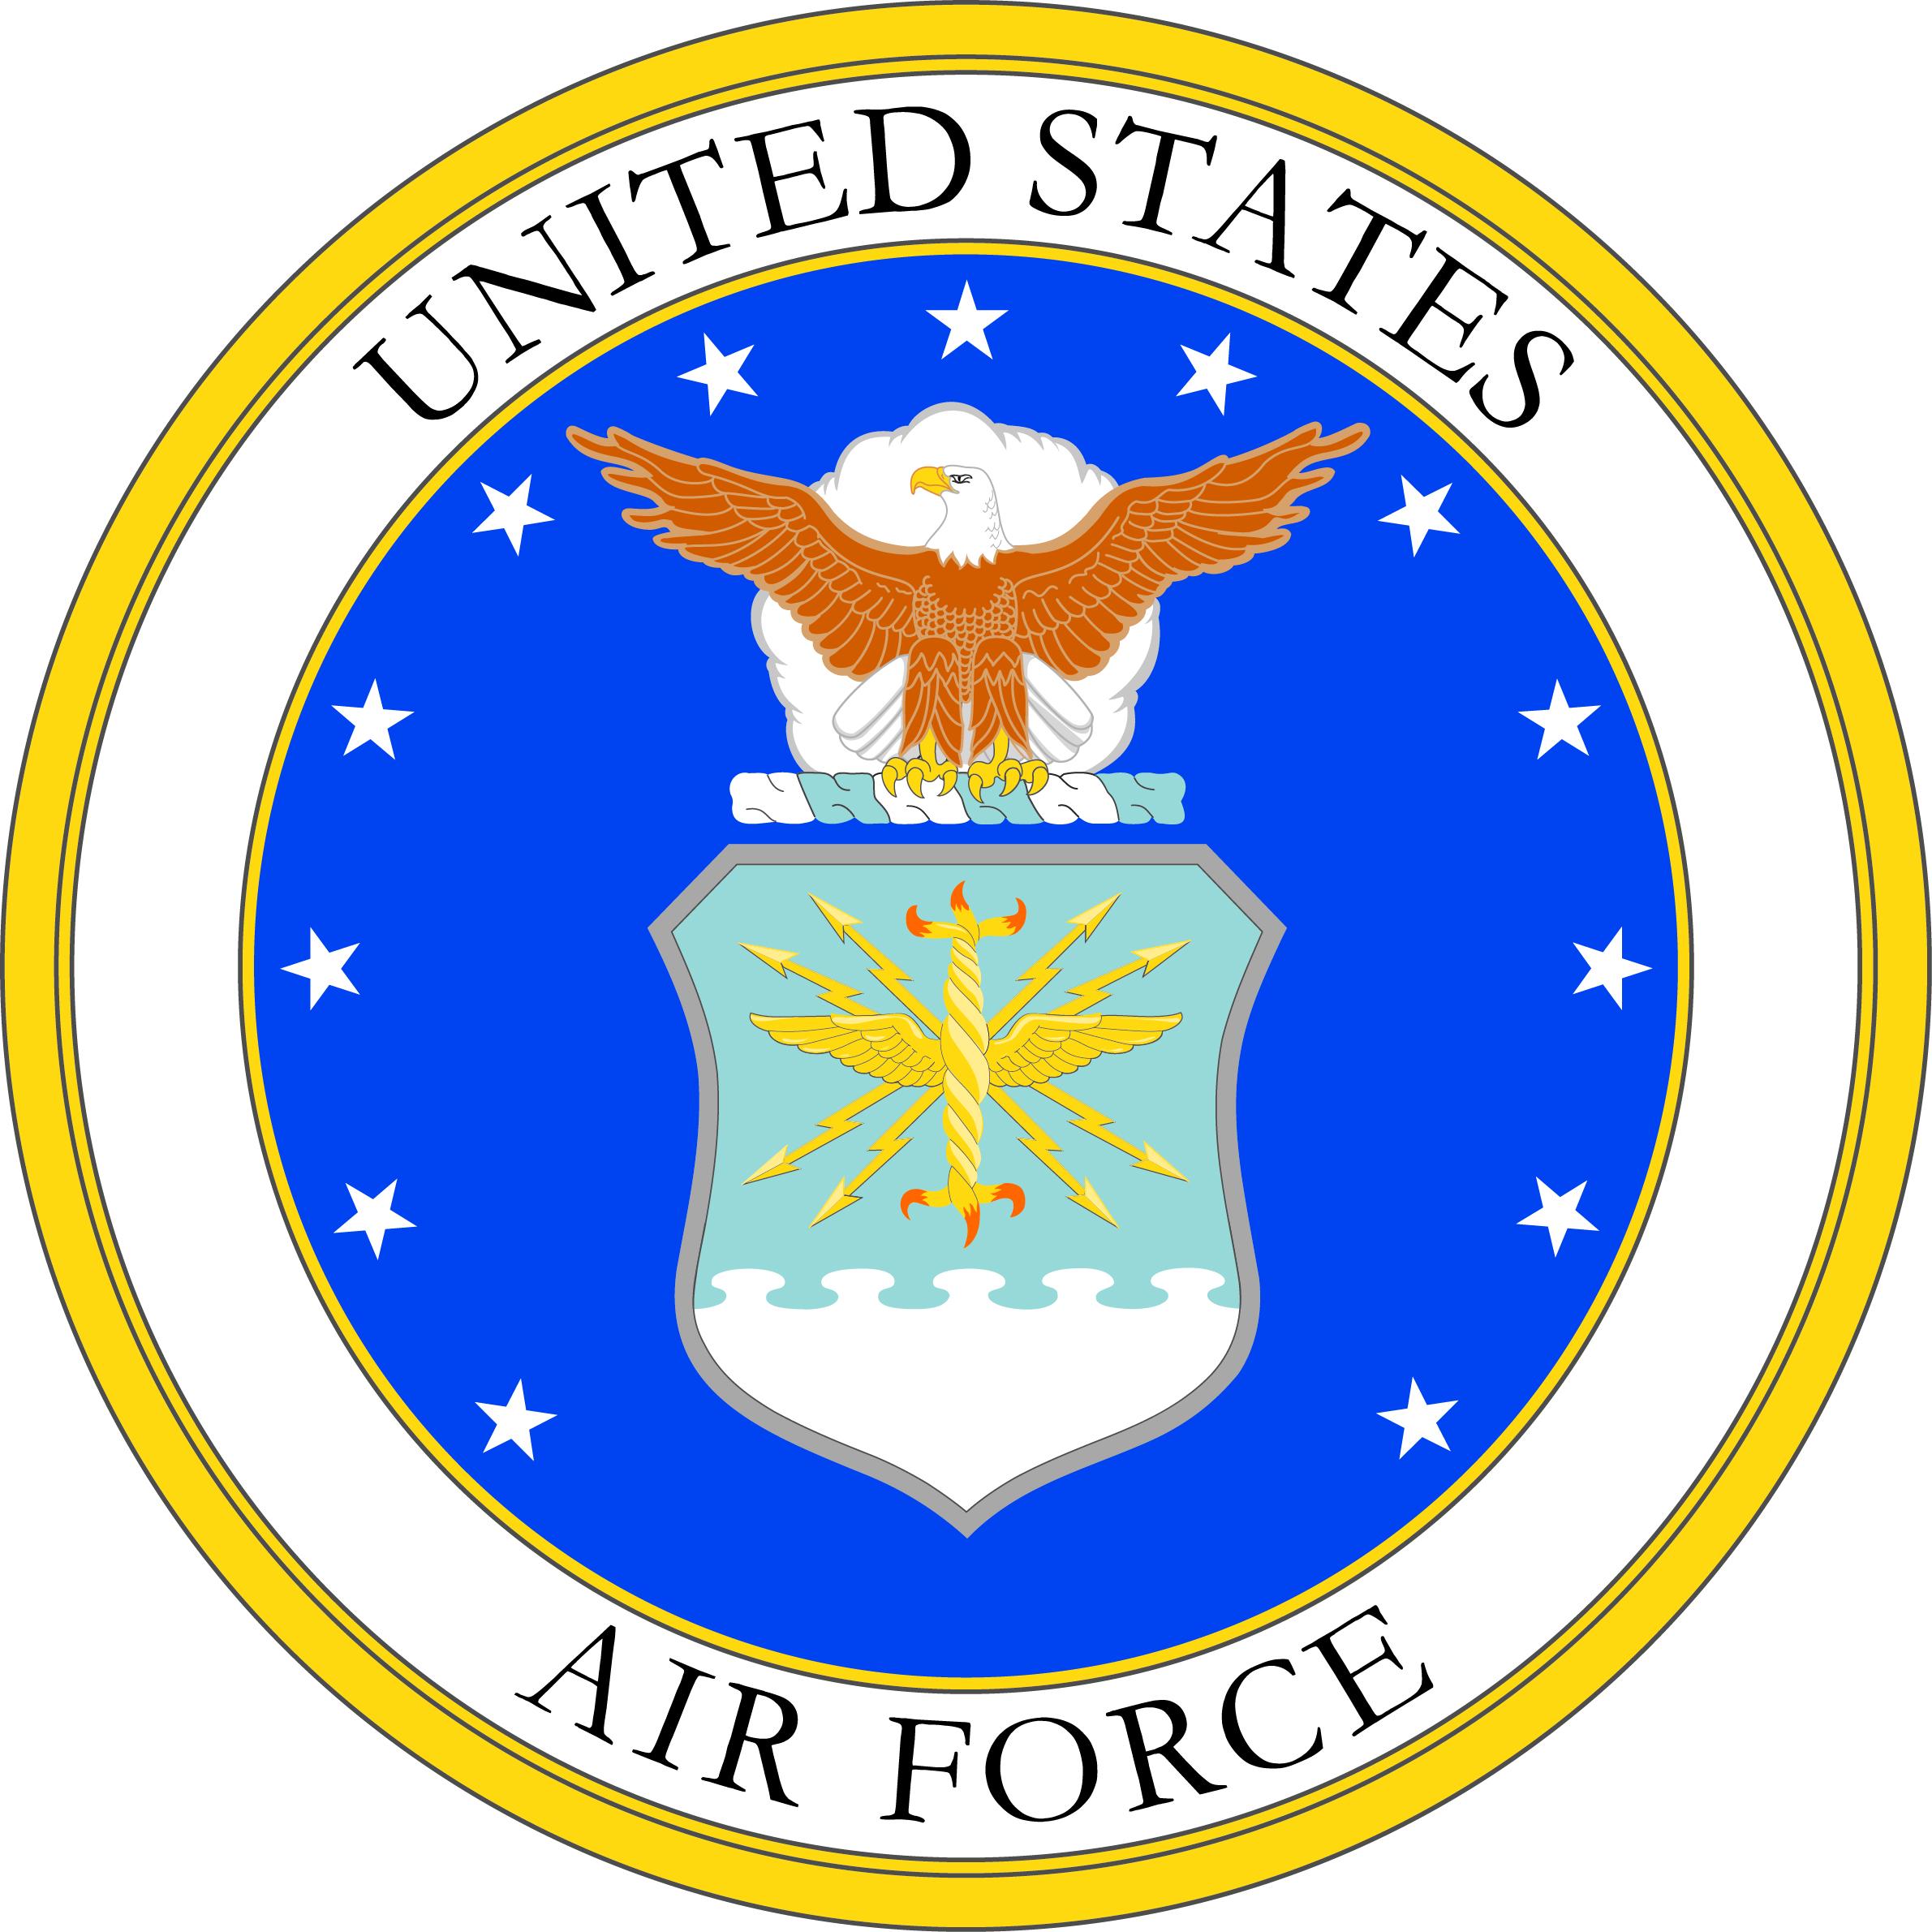 military insignia clipart - photo #31